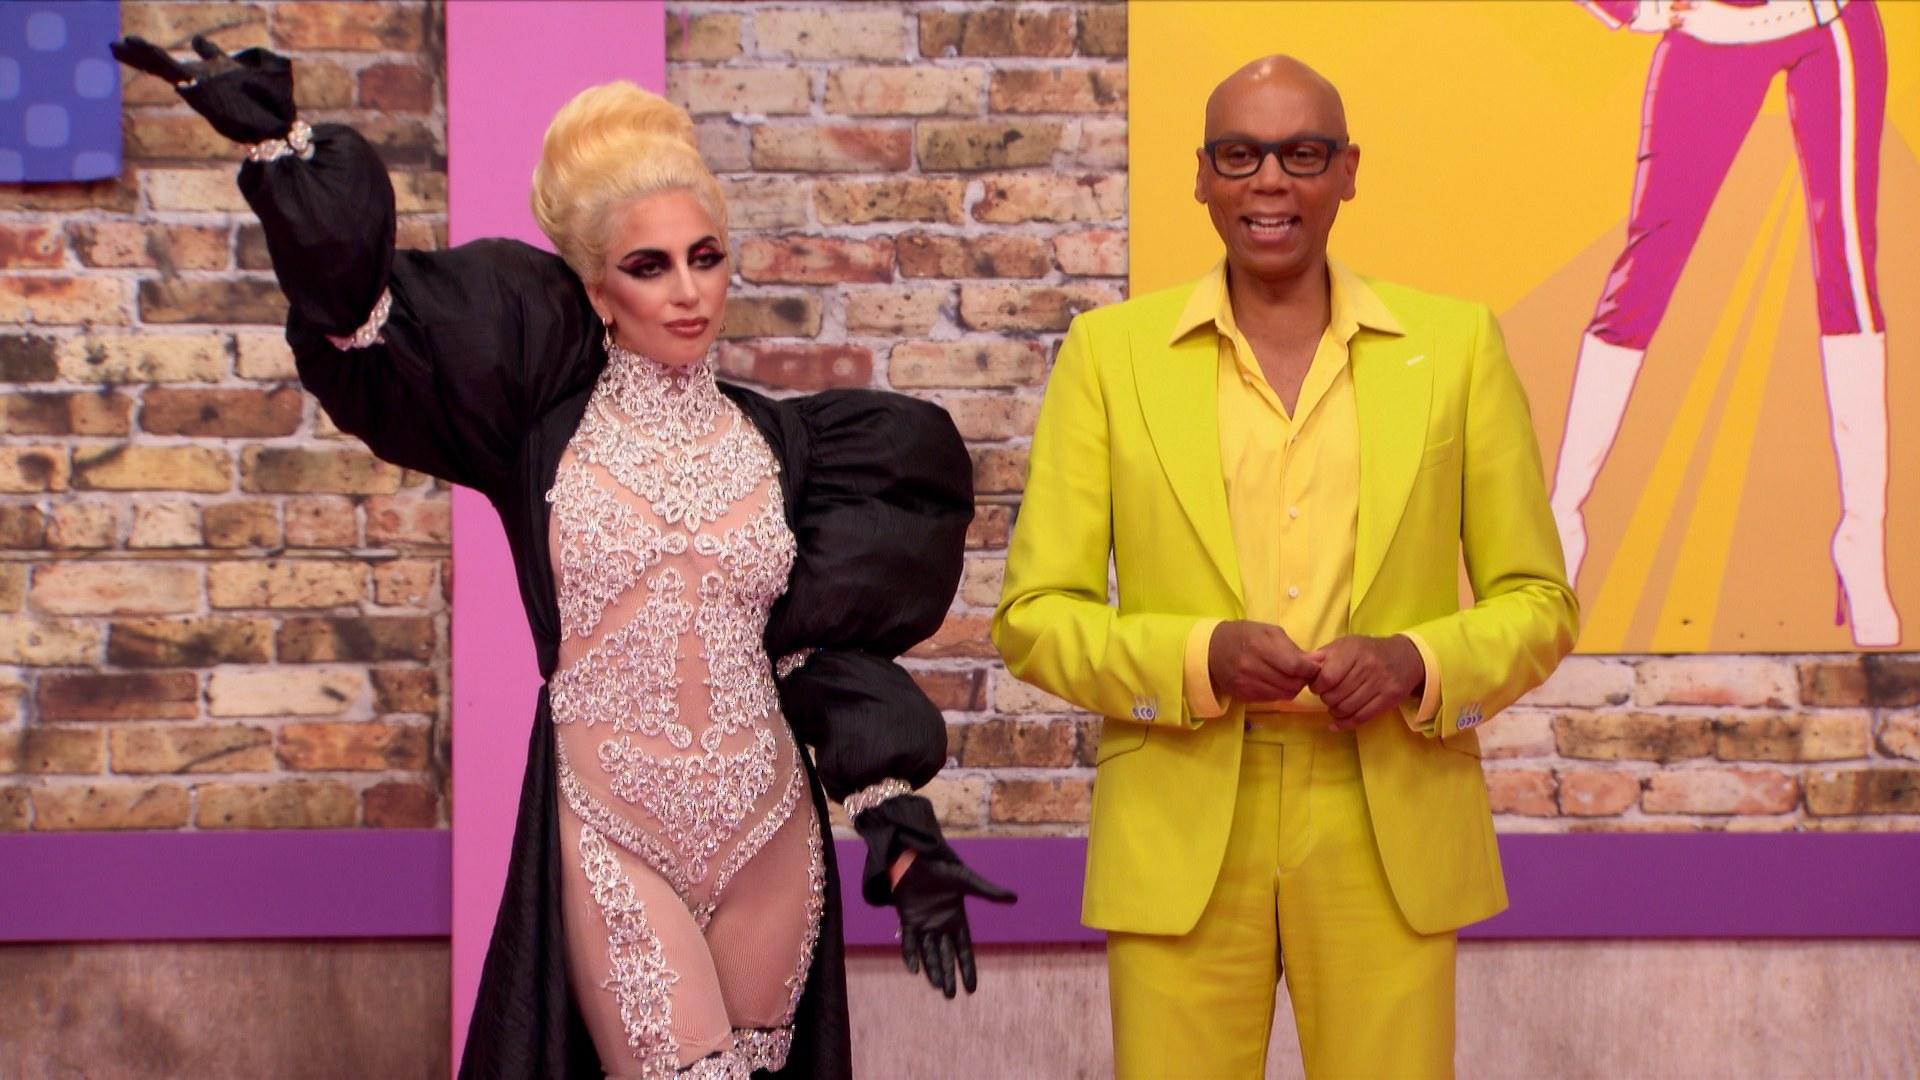 Lady Gaga in the premier of Drag Race season 9